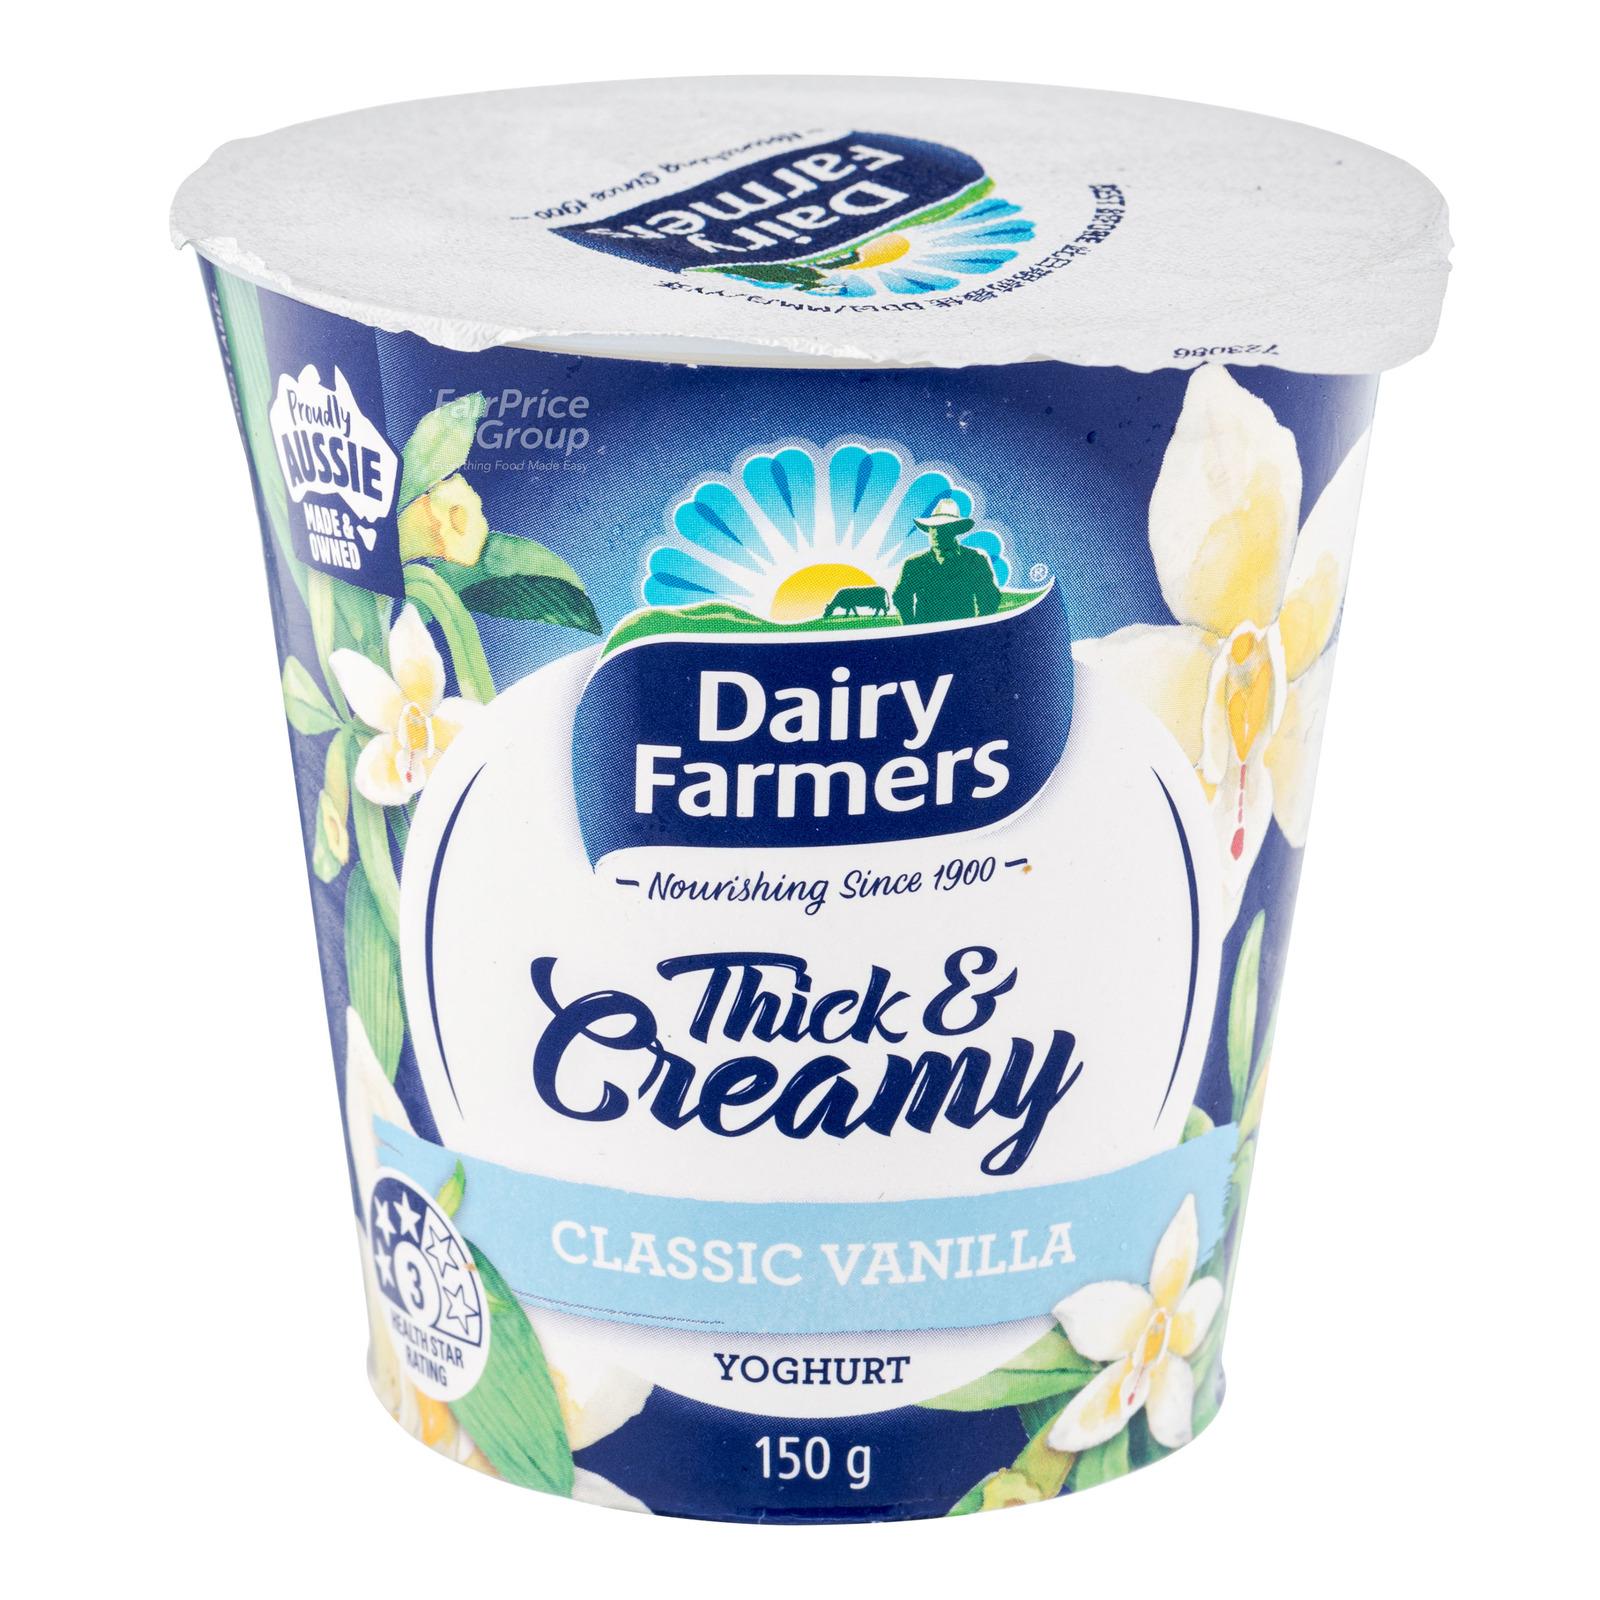 DAIRY FARMERS Yoghurt Thick & Creamy Classic Vanilla 150g